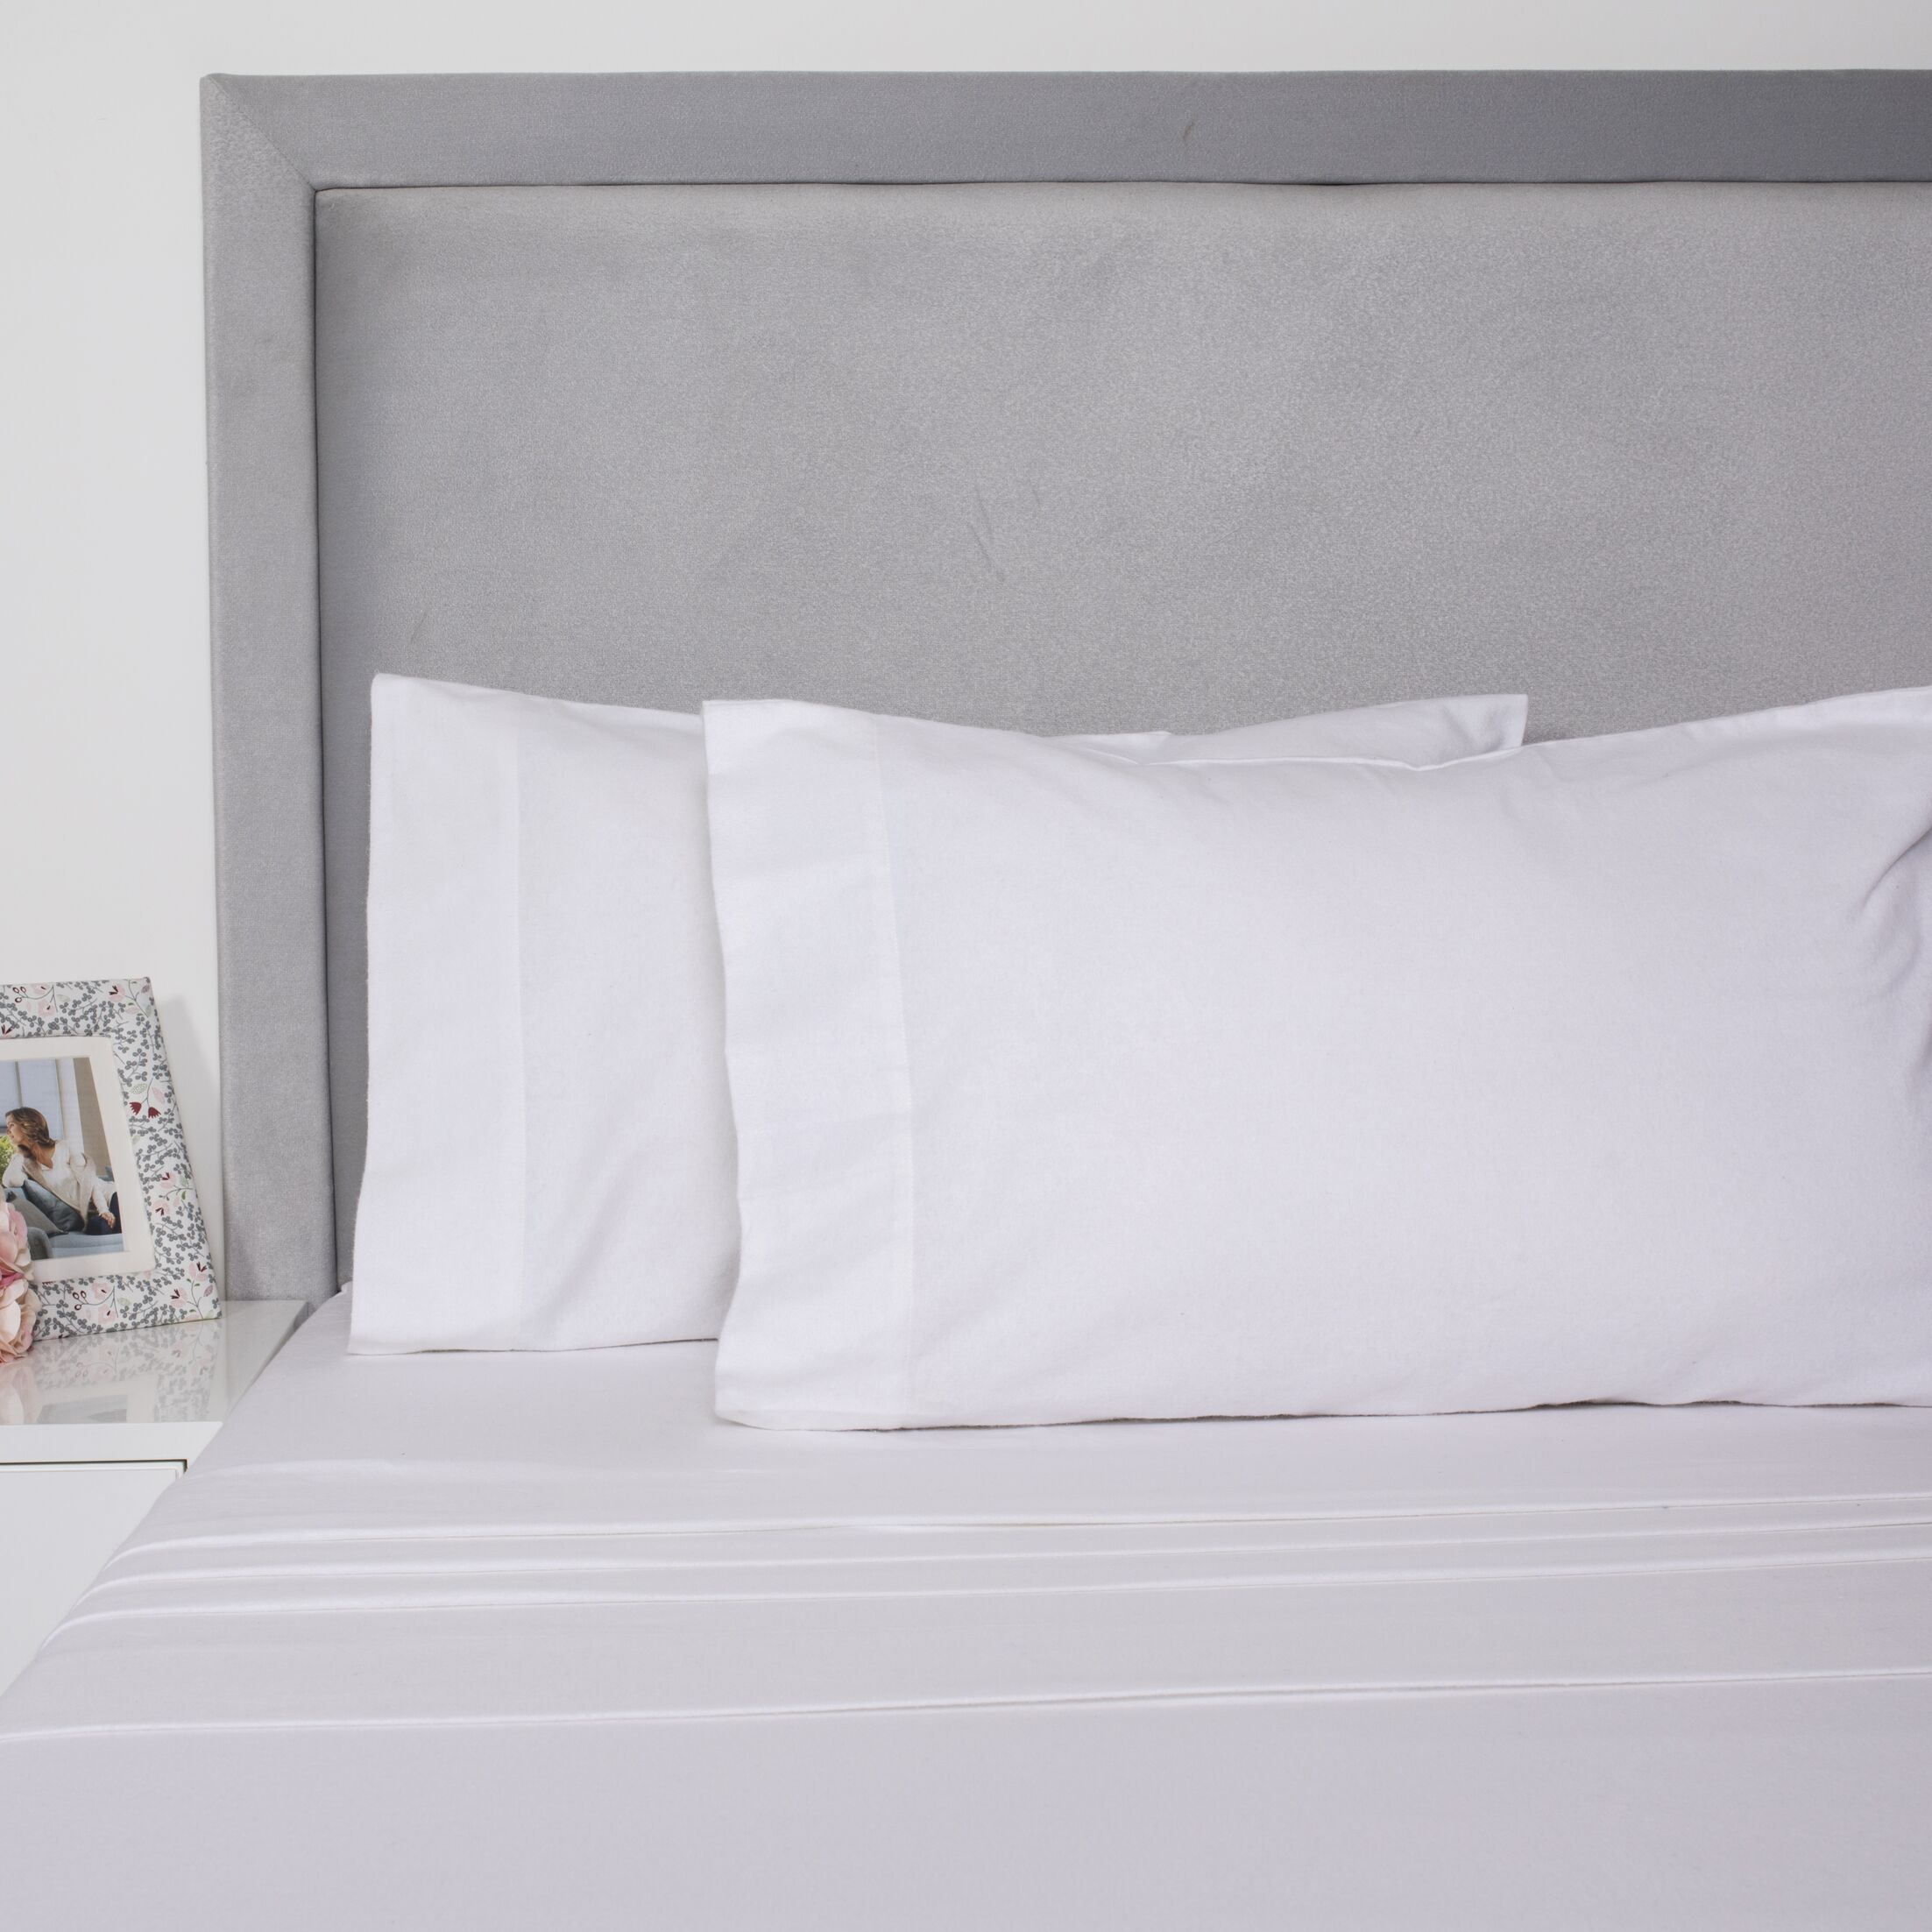 Yarn Dyed Cotton Sheet Set Color: White, Size: King